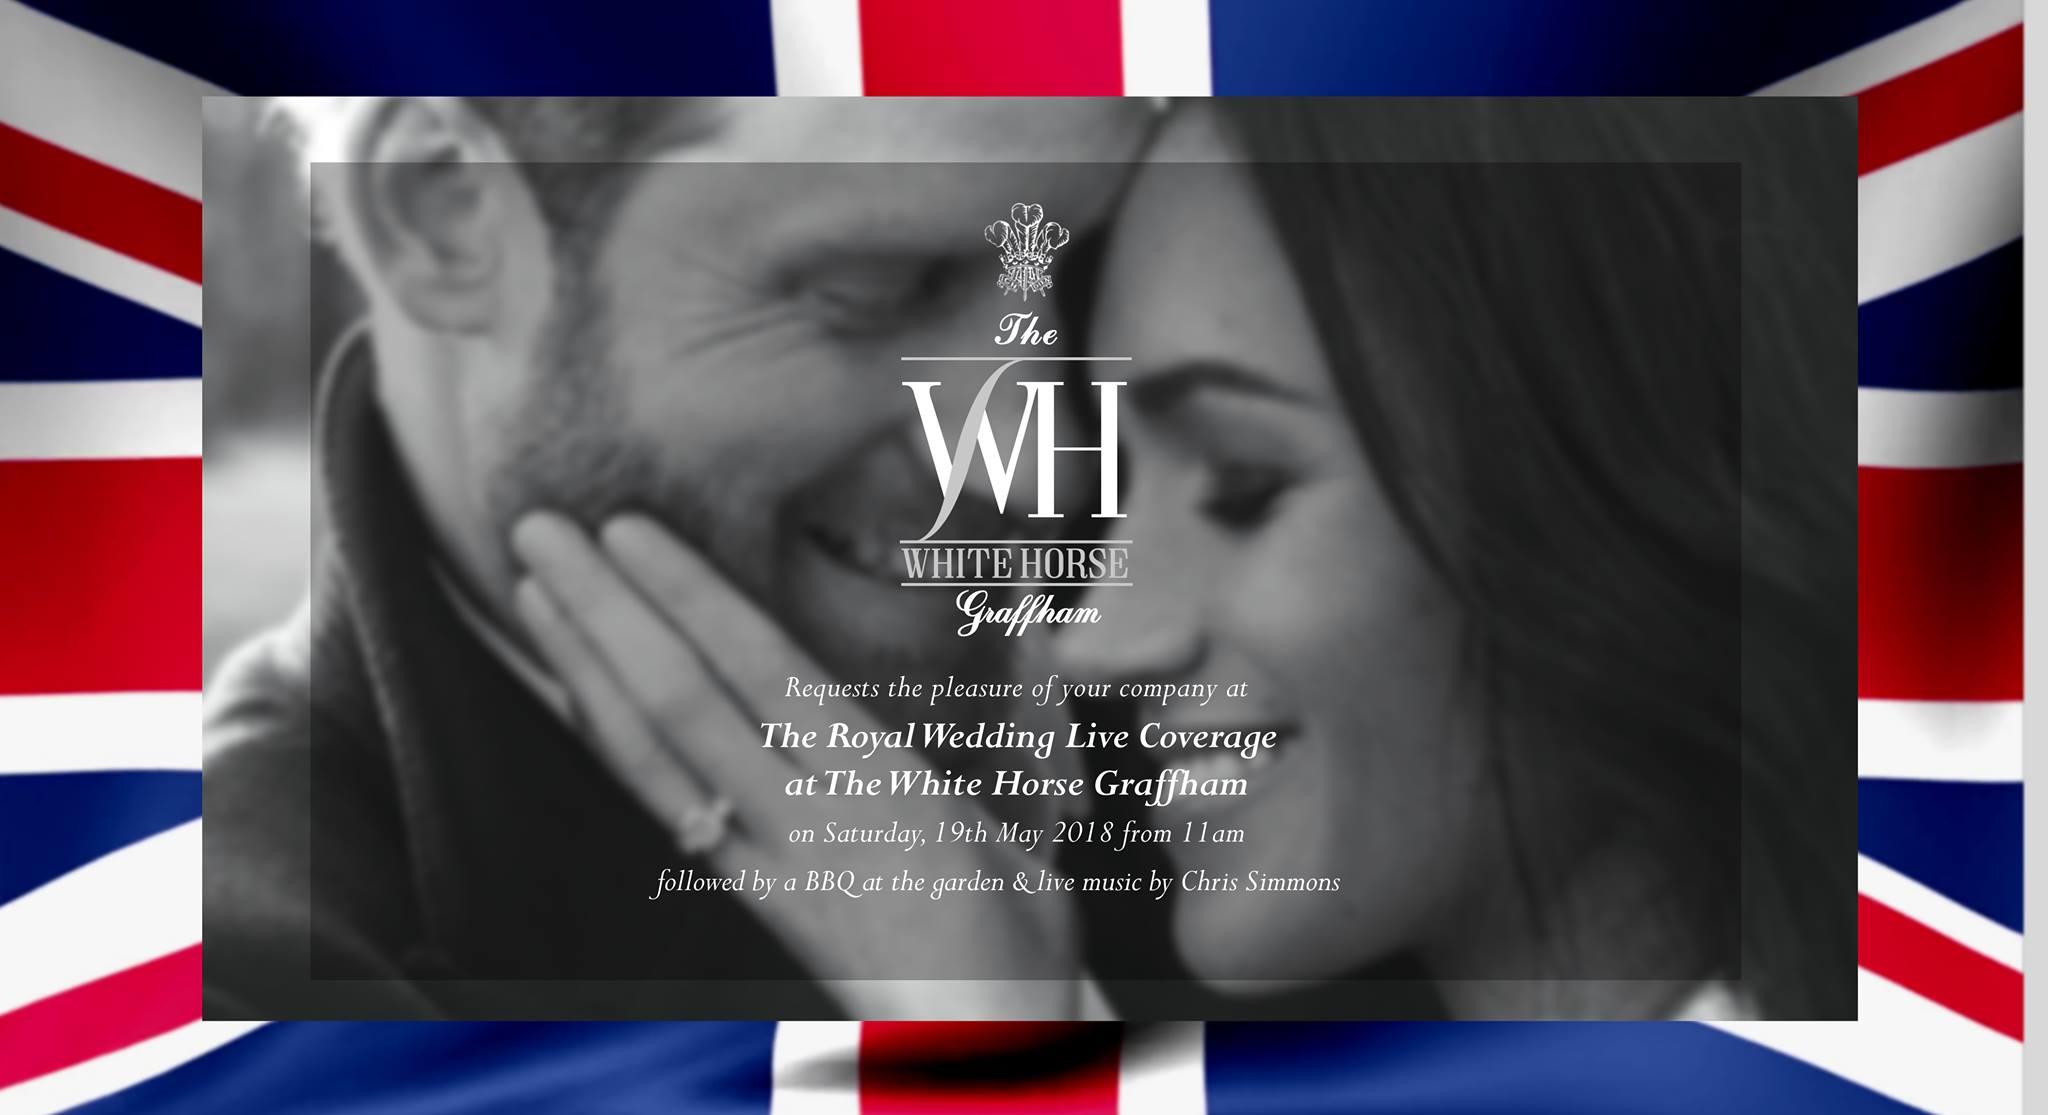 The Royal Wedding Garden Party at The White Horse Graffham